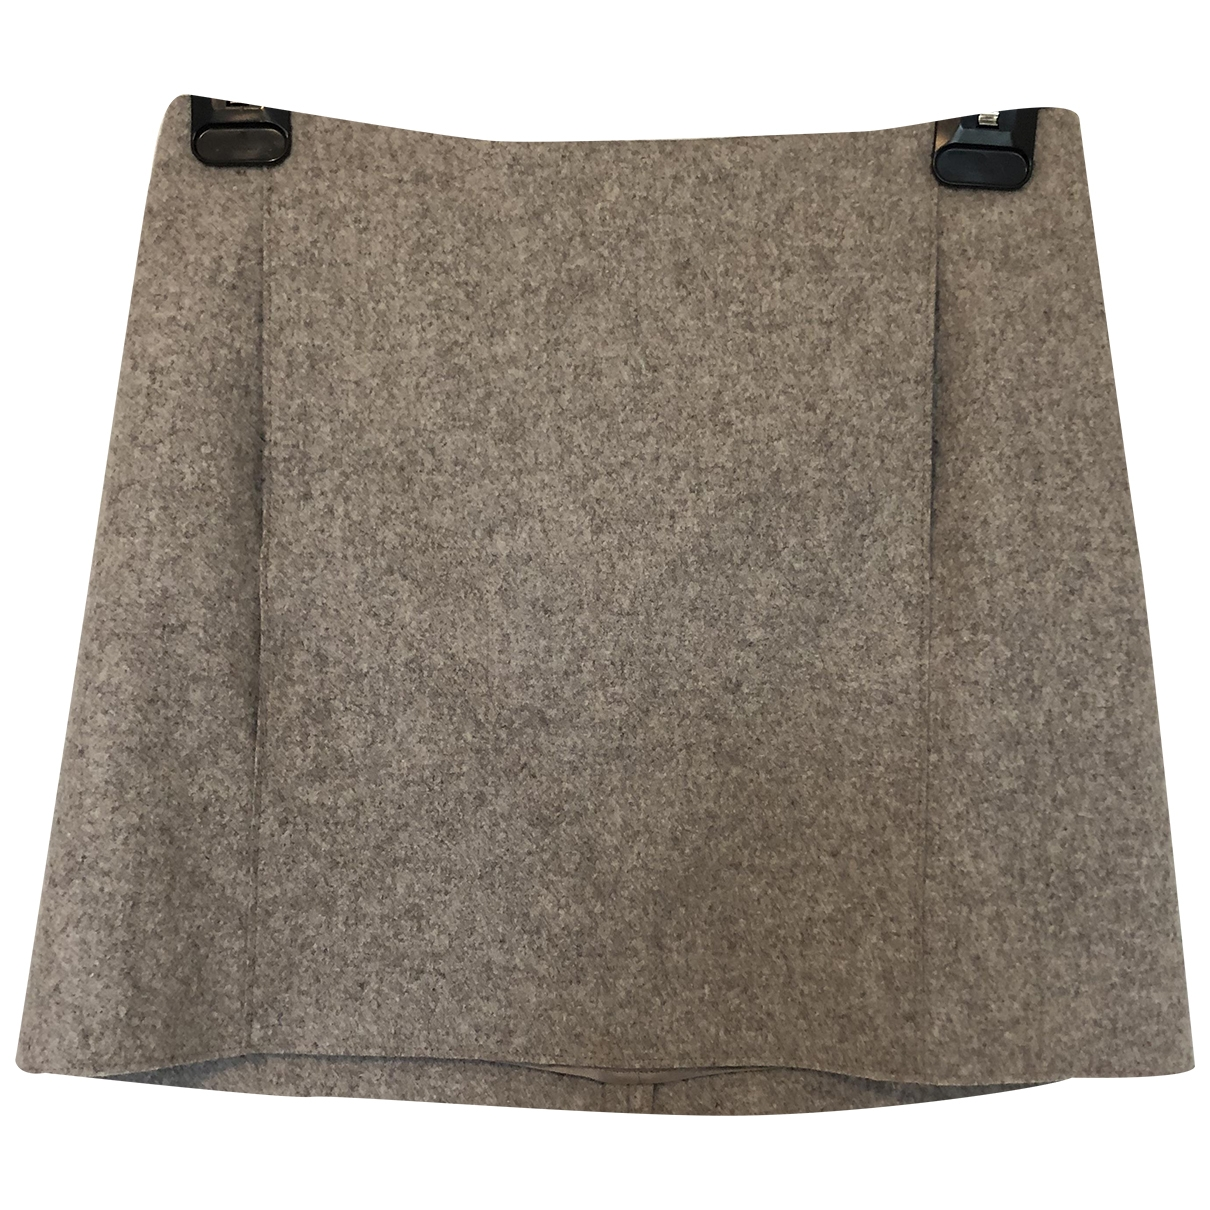 Cos \N Beige Wool skirt for Women 34 FR